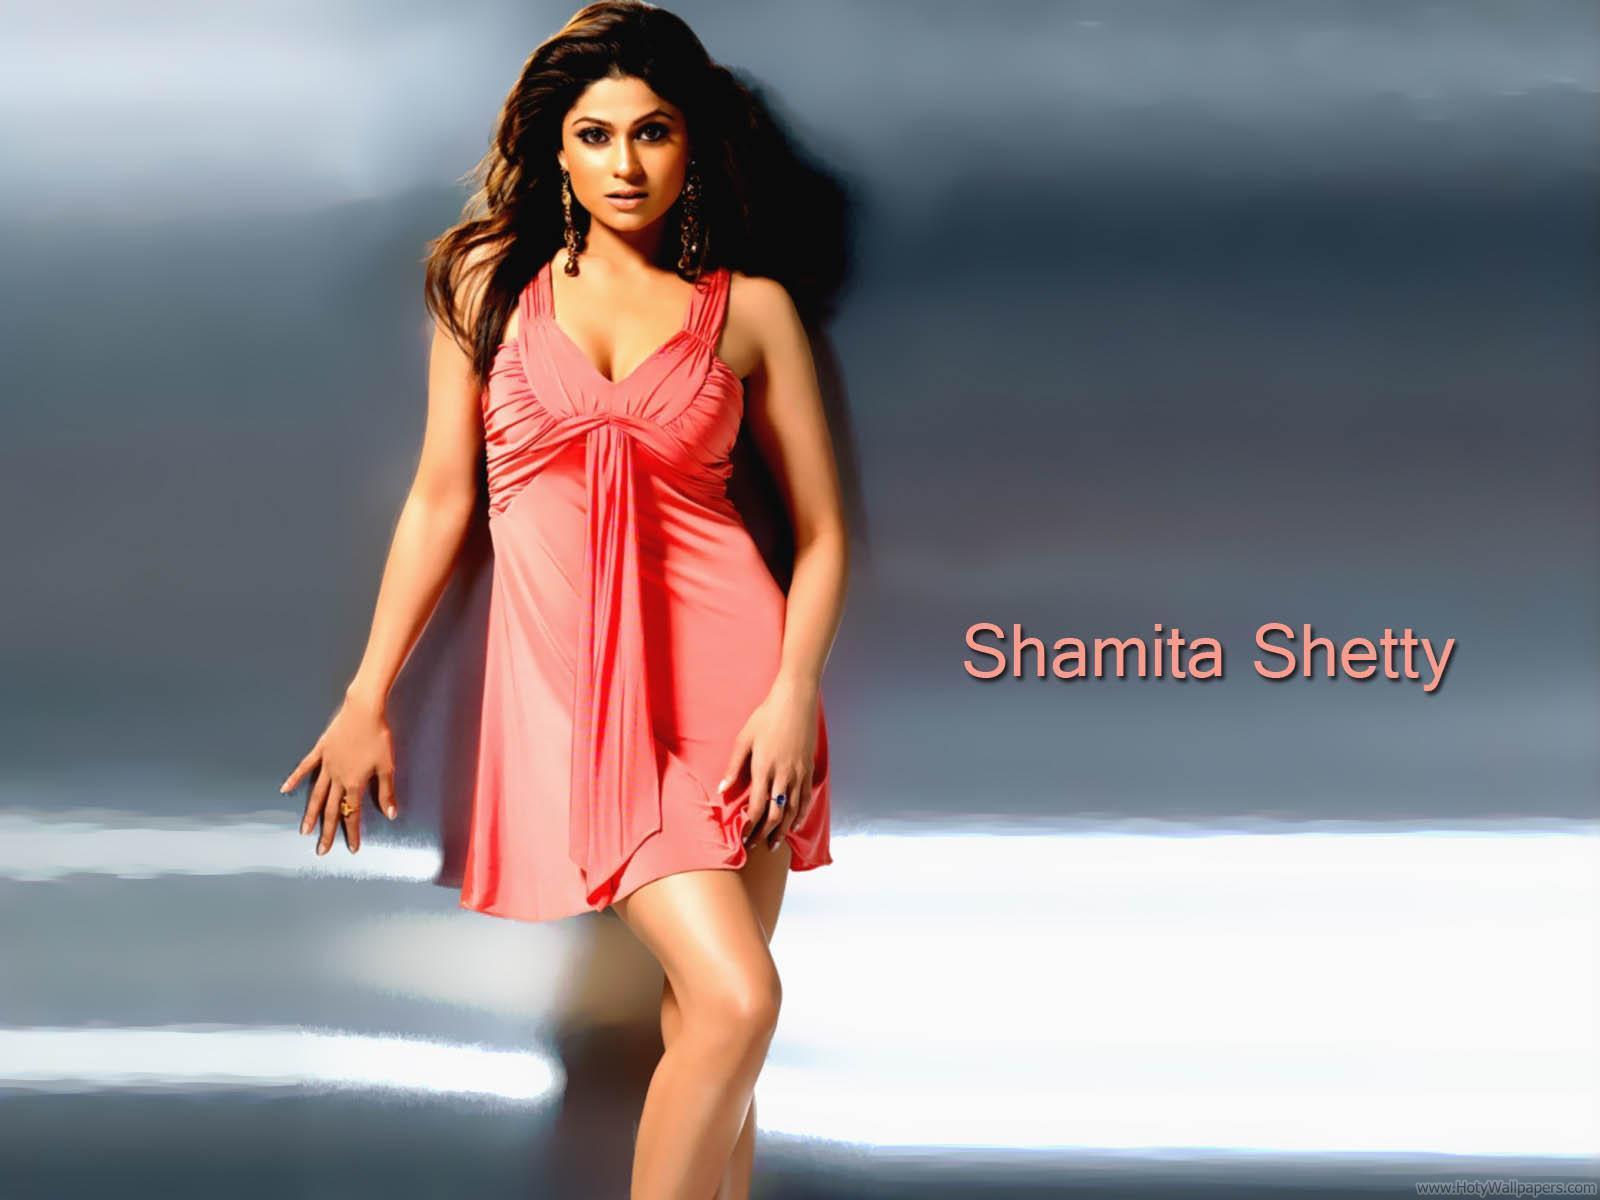 http://1.bp.blogspot.com/-MbXRFBtzo9M/Tw7VKIEo96I/AAAAAAAAR9o/802LLYvyhW0/s1600/shamita_shetty_glamorous_wallpaper.jpg